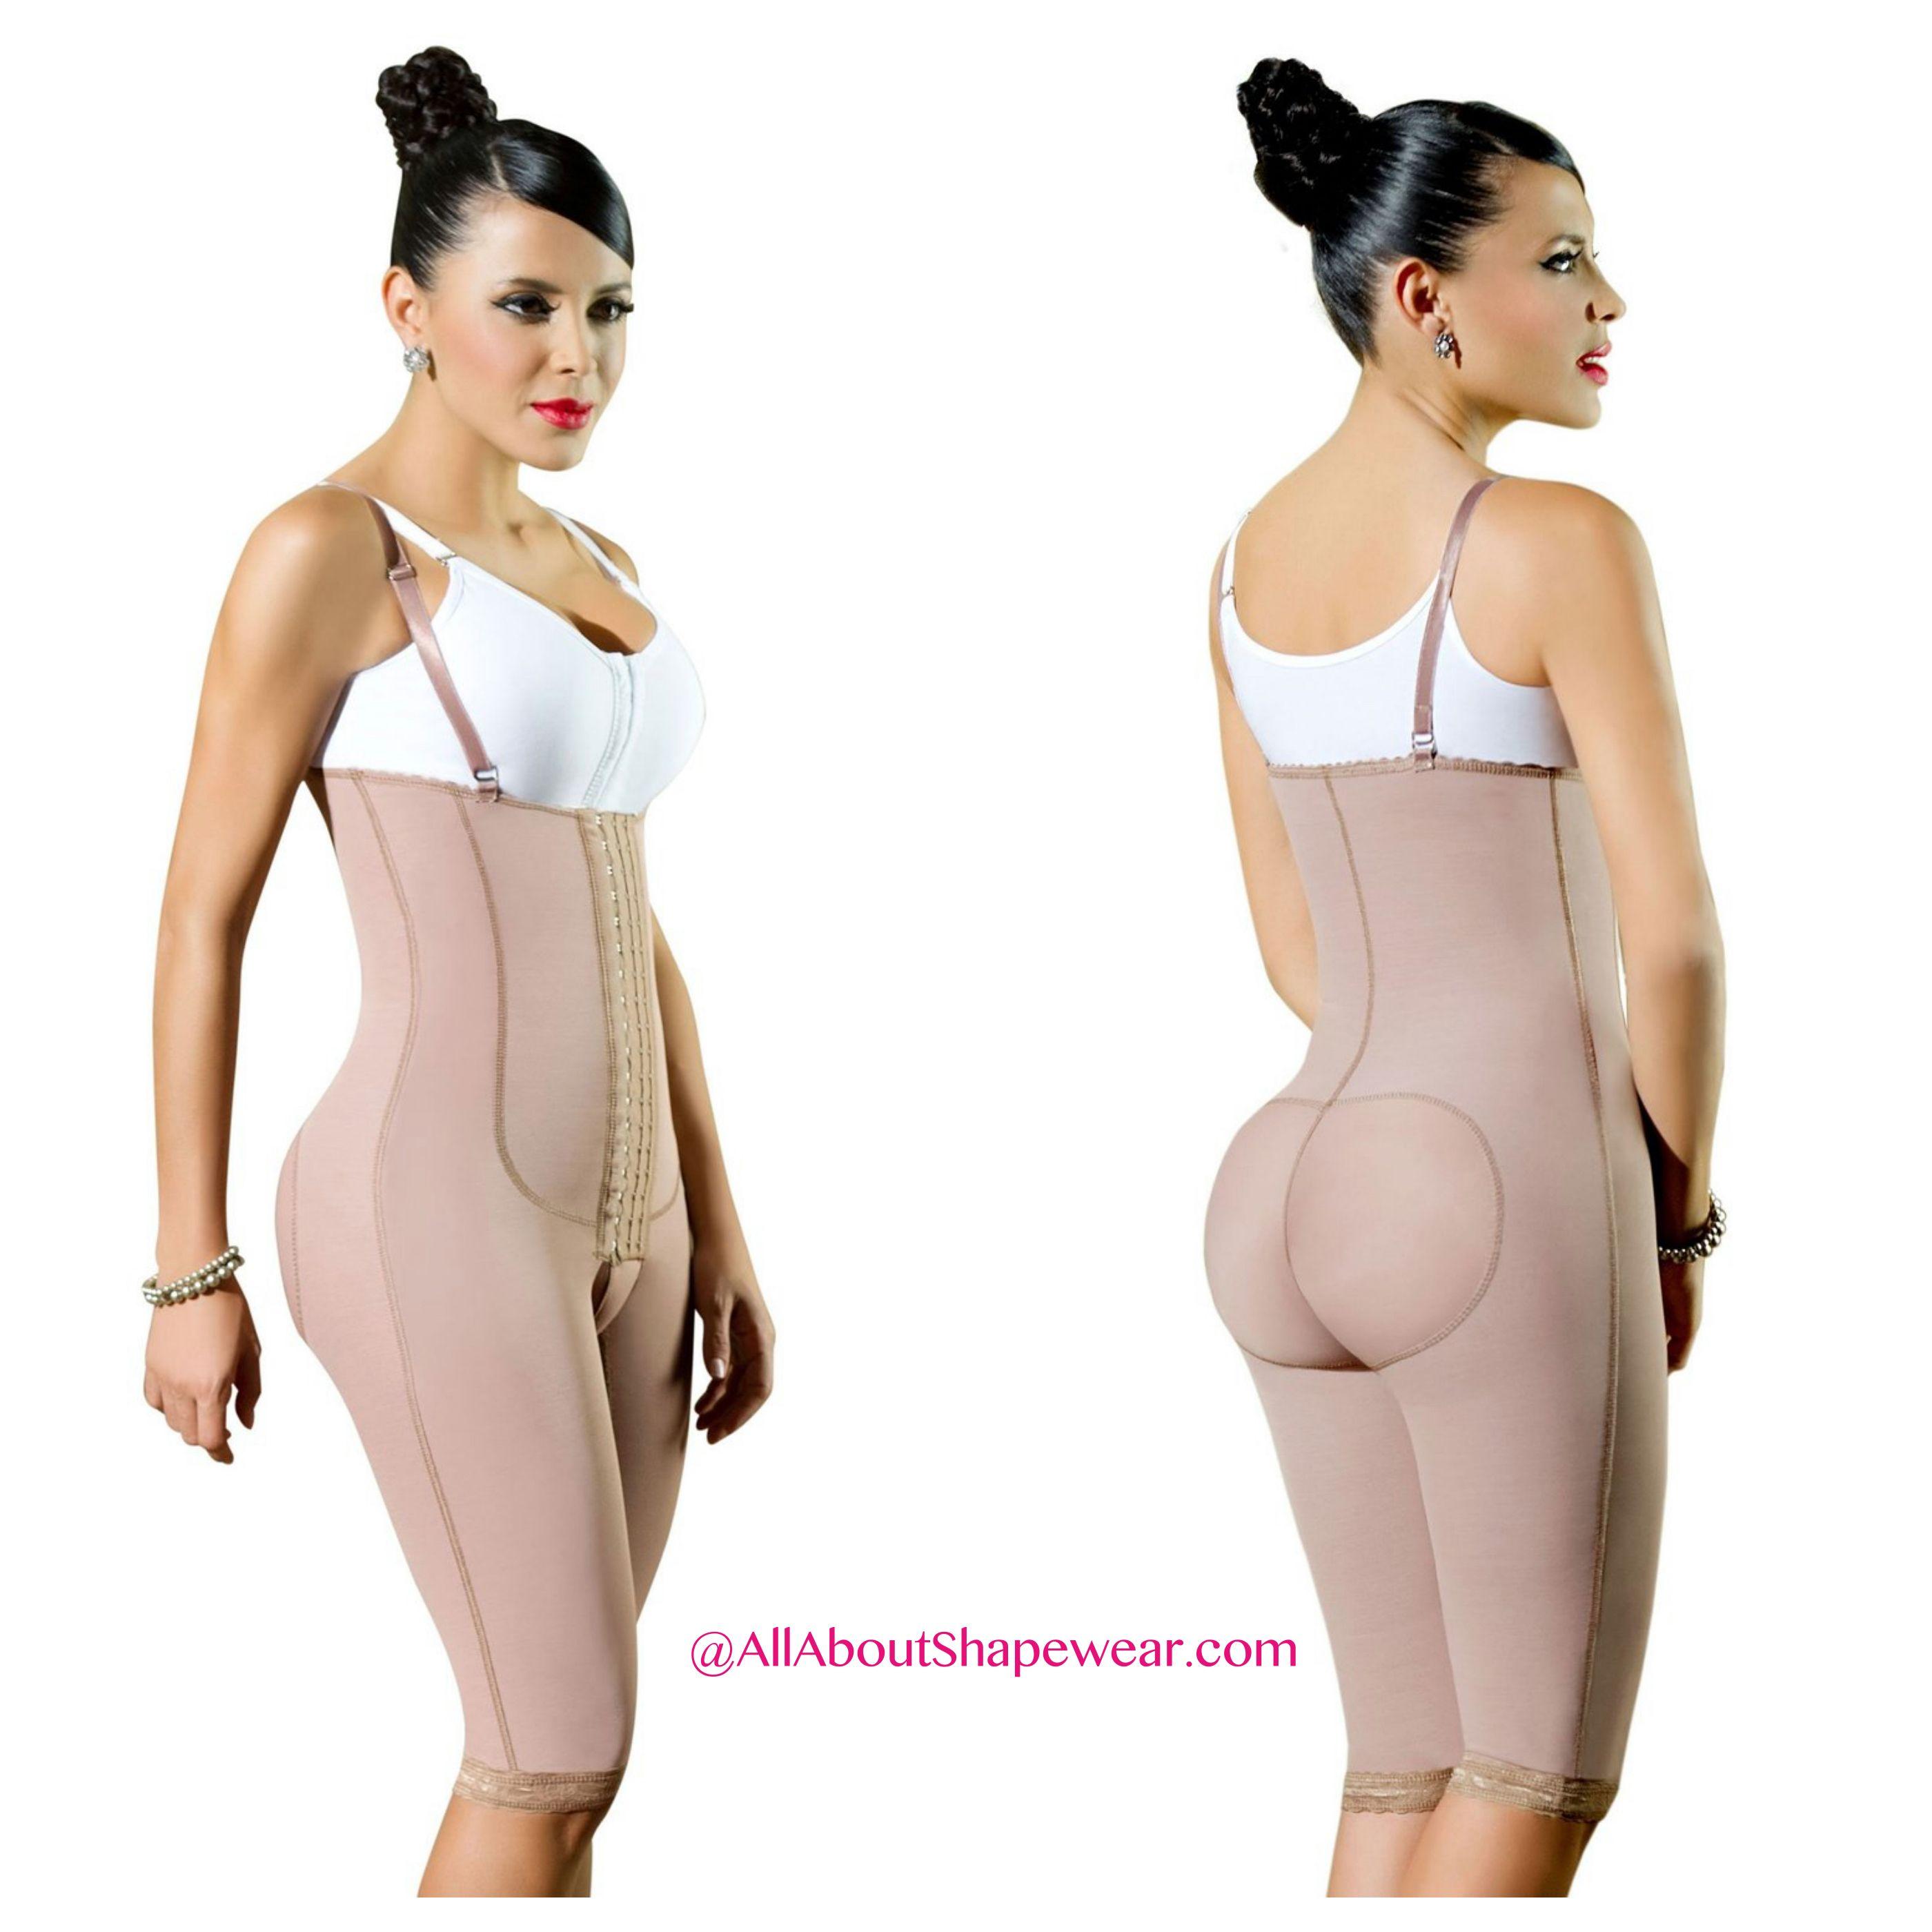 Fajas Diseños de Prada Backless Strapless Bodysuit Shapewear